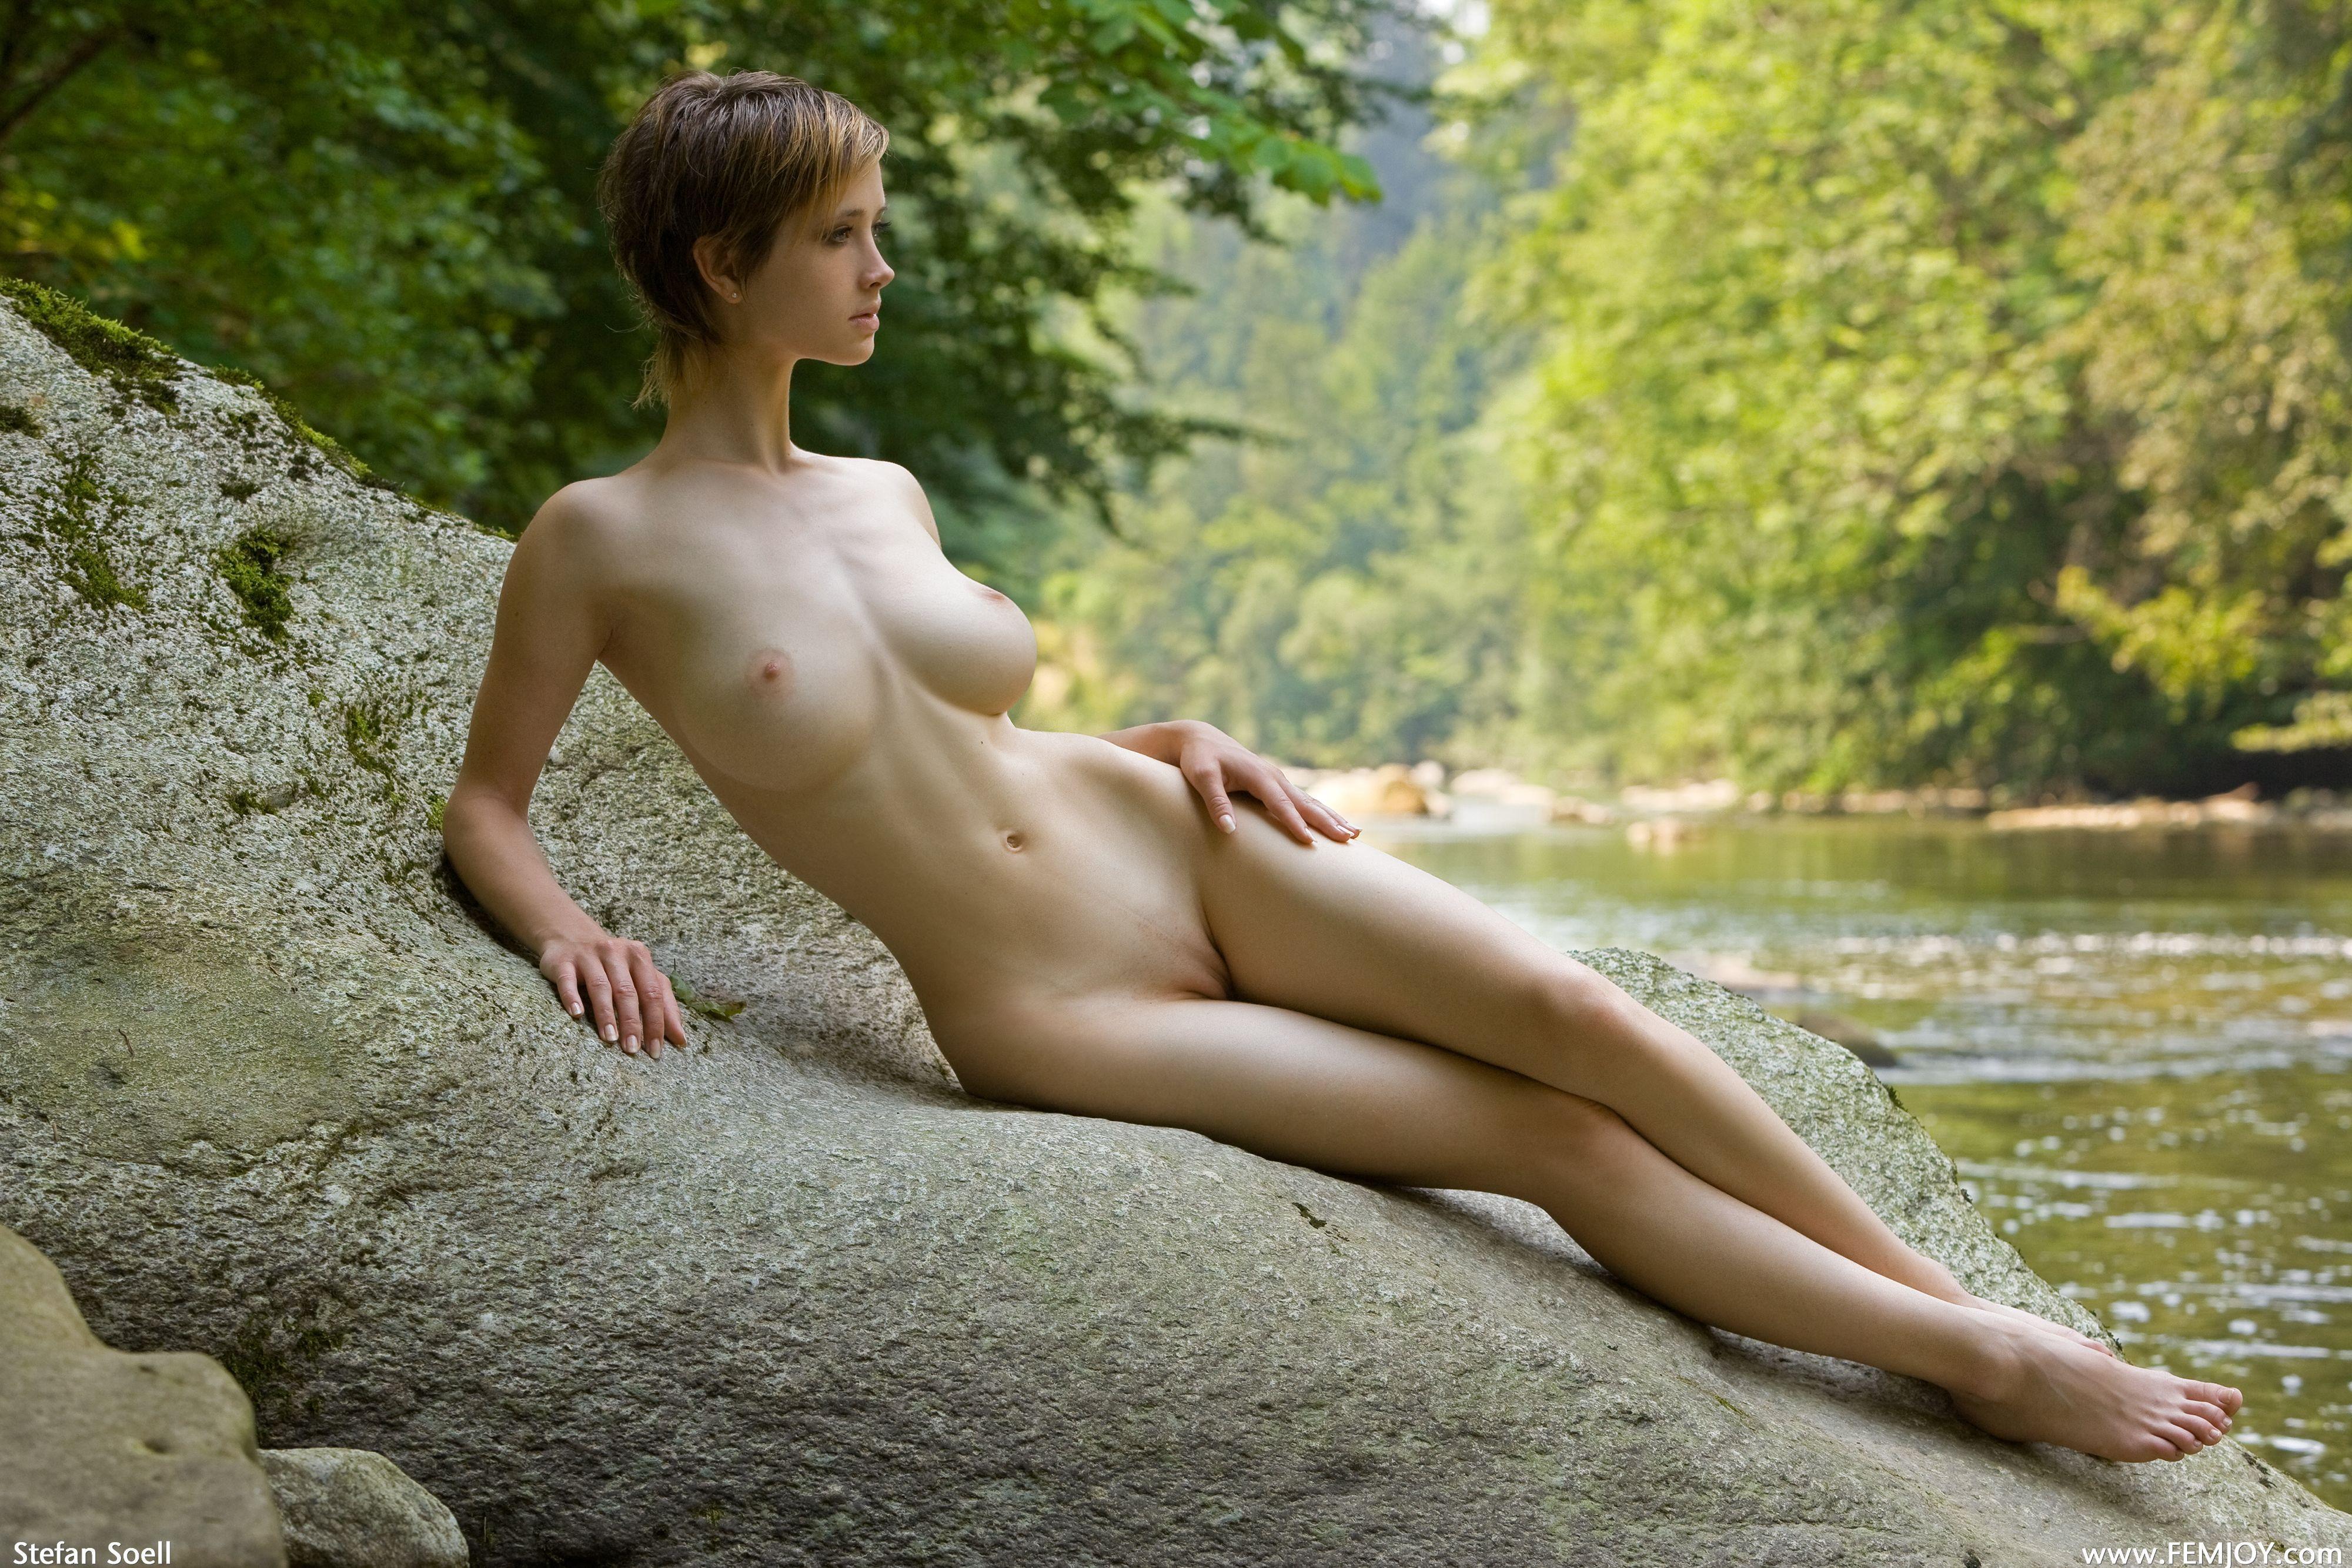 Autumn riley naked girl